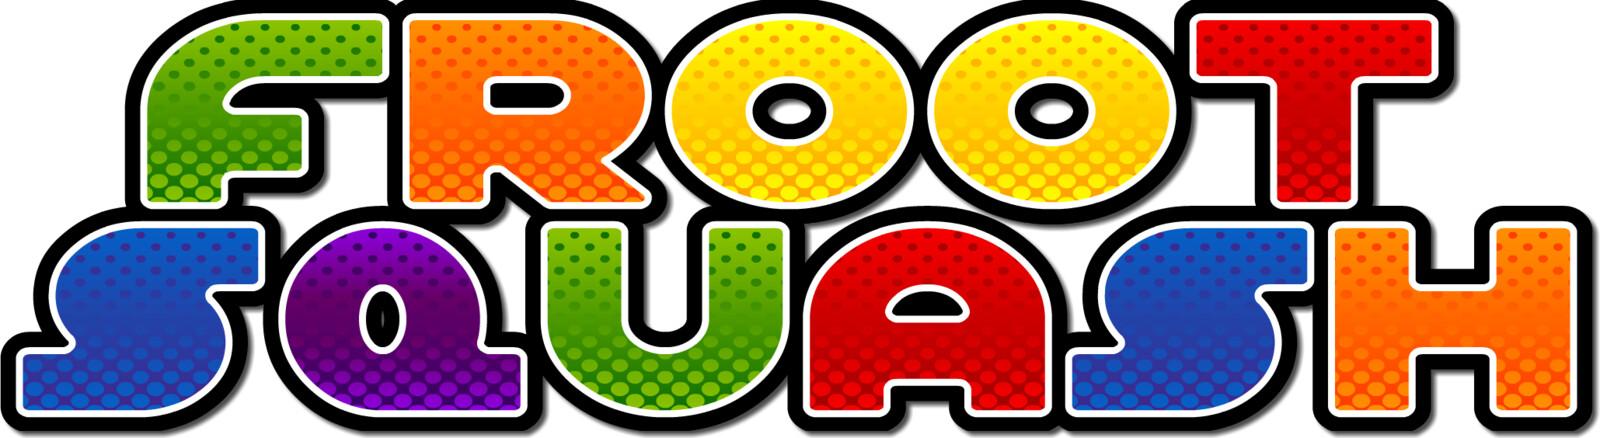 Froot Squash Logo 2 Line